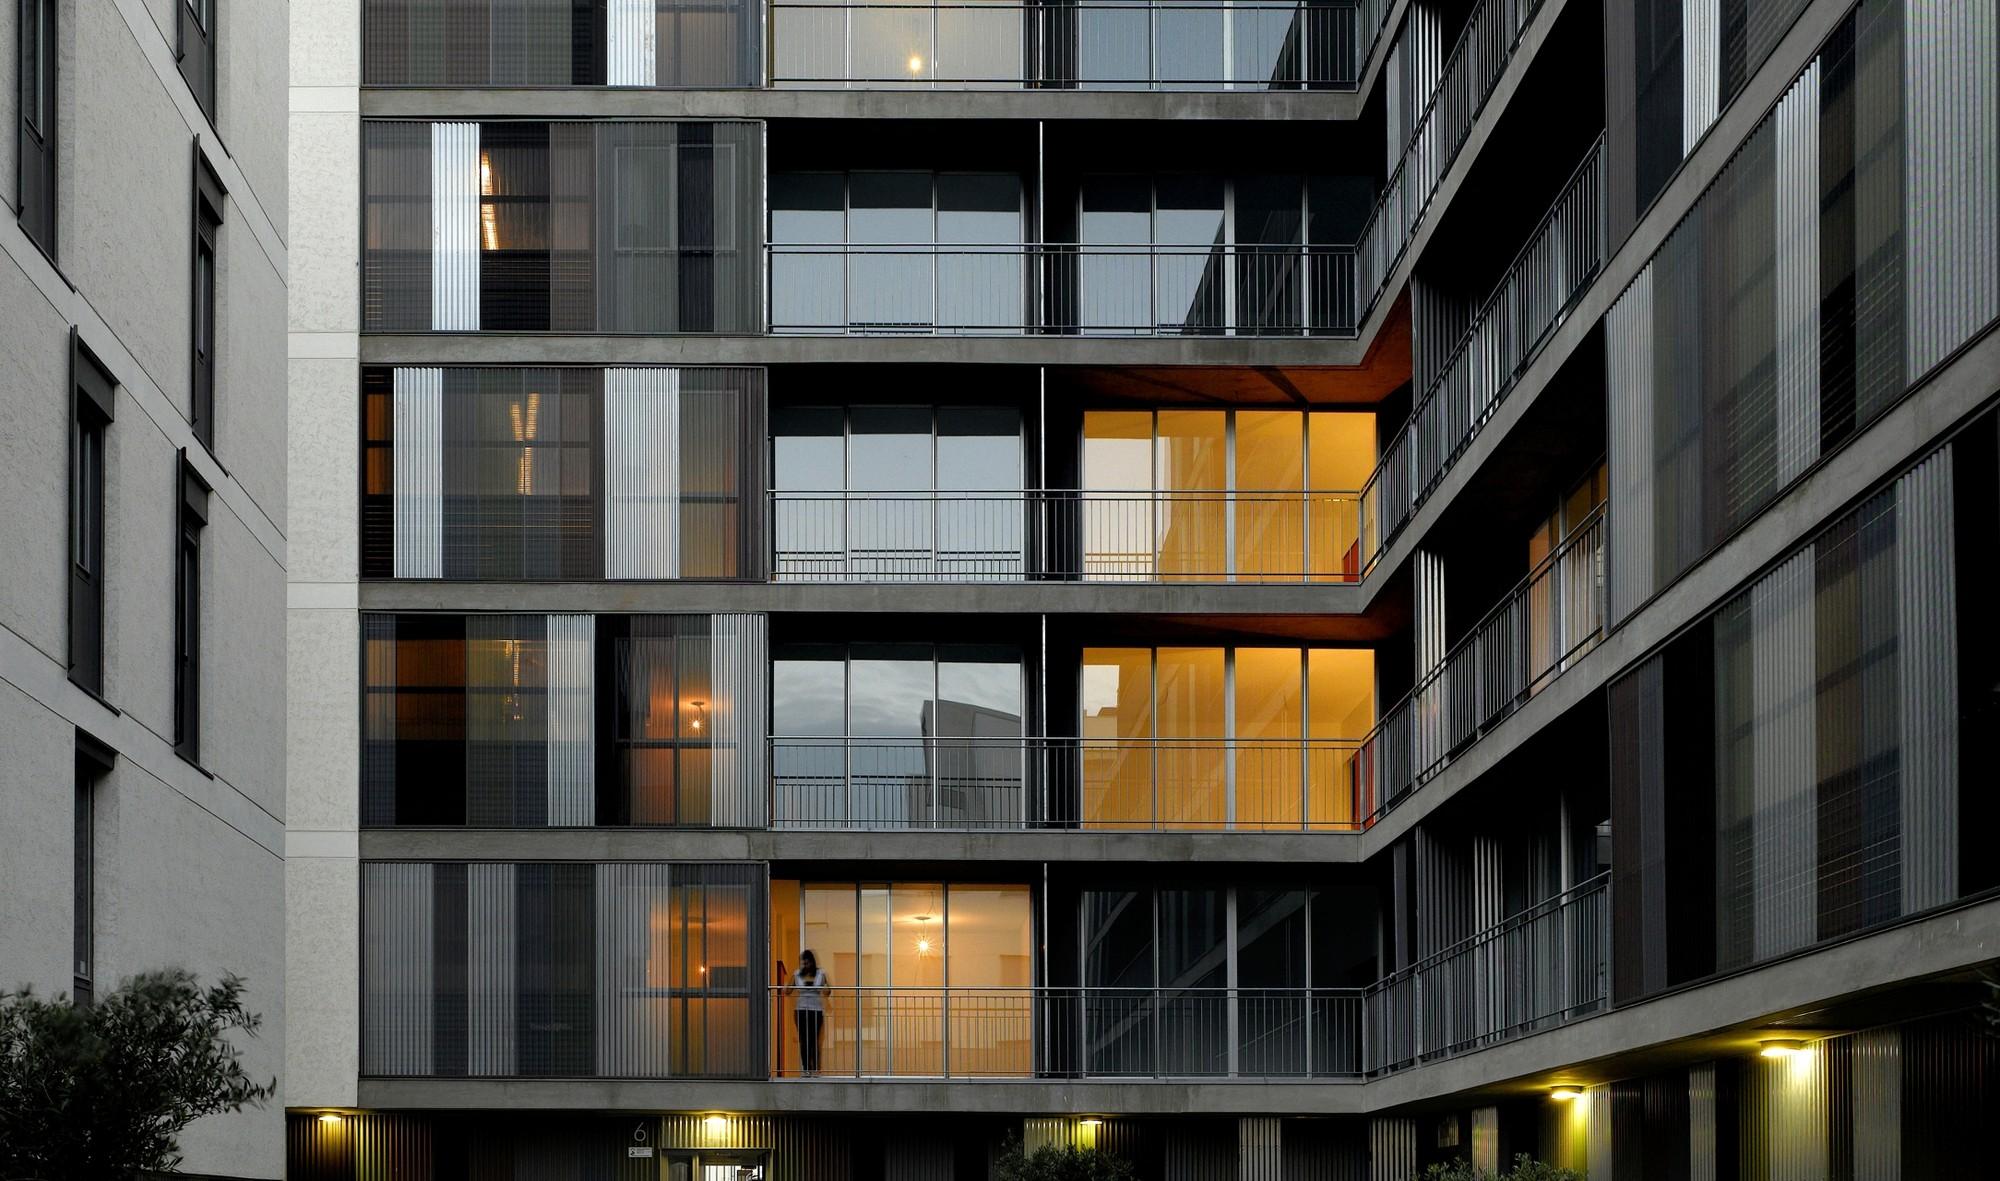 Urban Houses Architectural Design